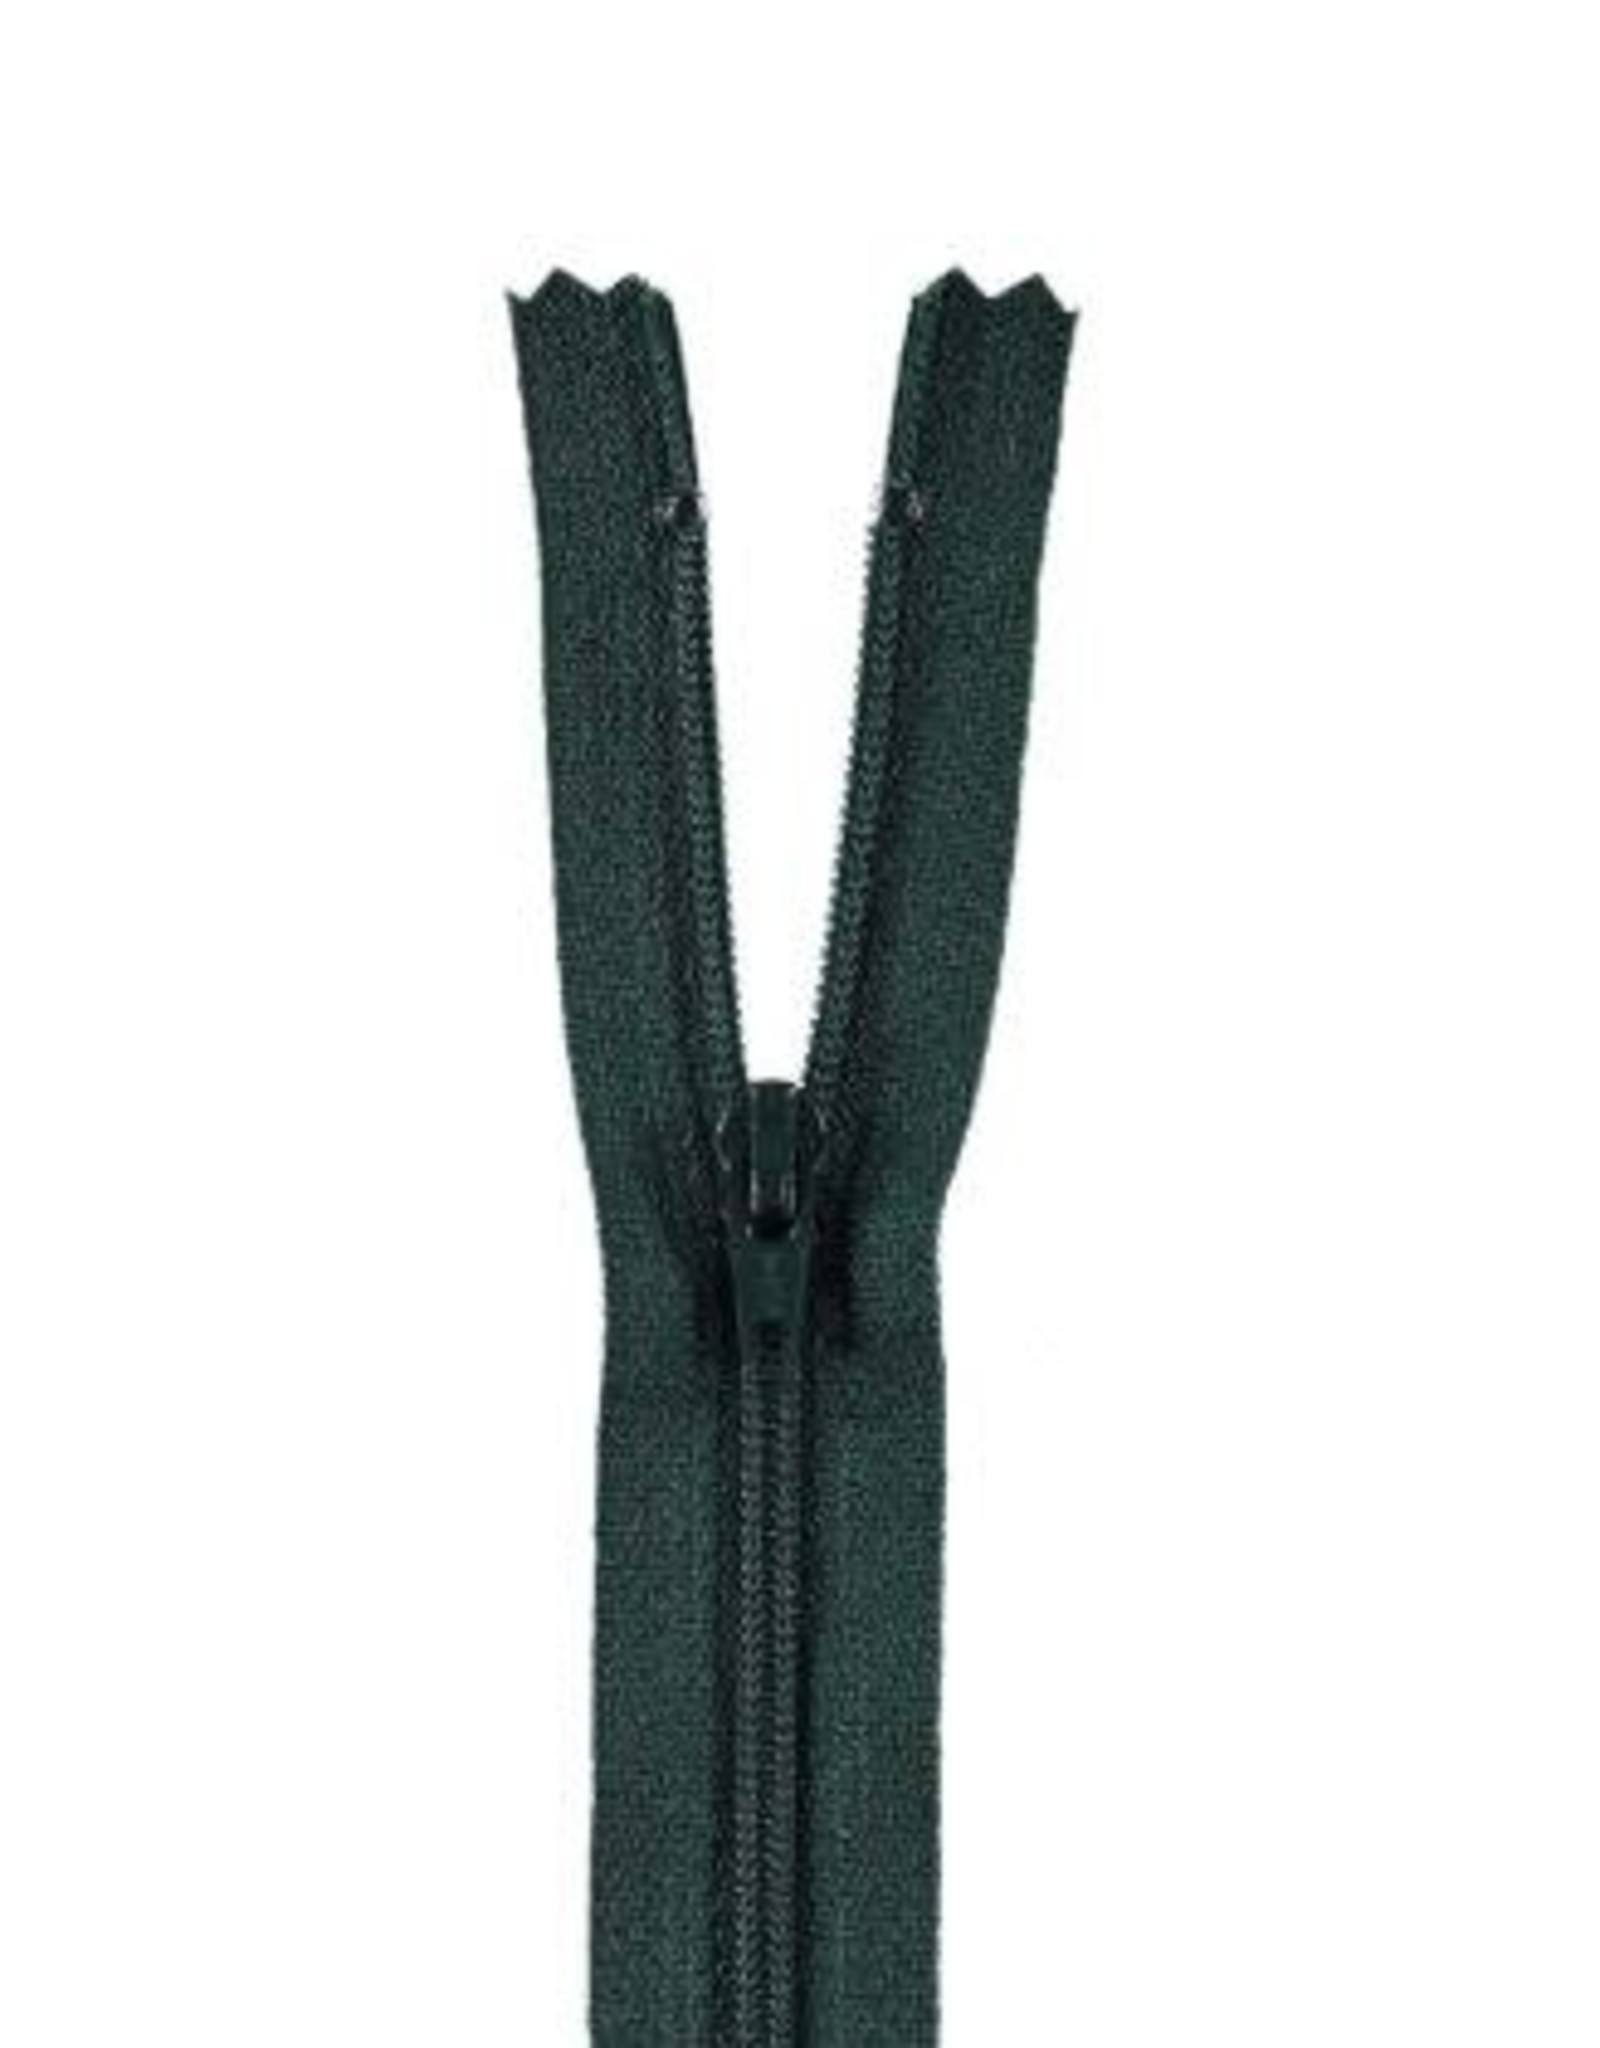 YKK Spiraalrits niet-DB 3mm donker groen 890-45cm